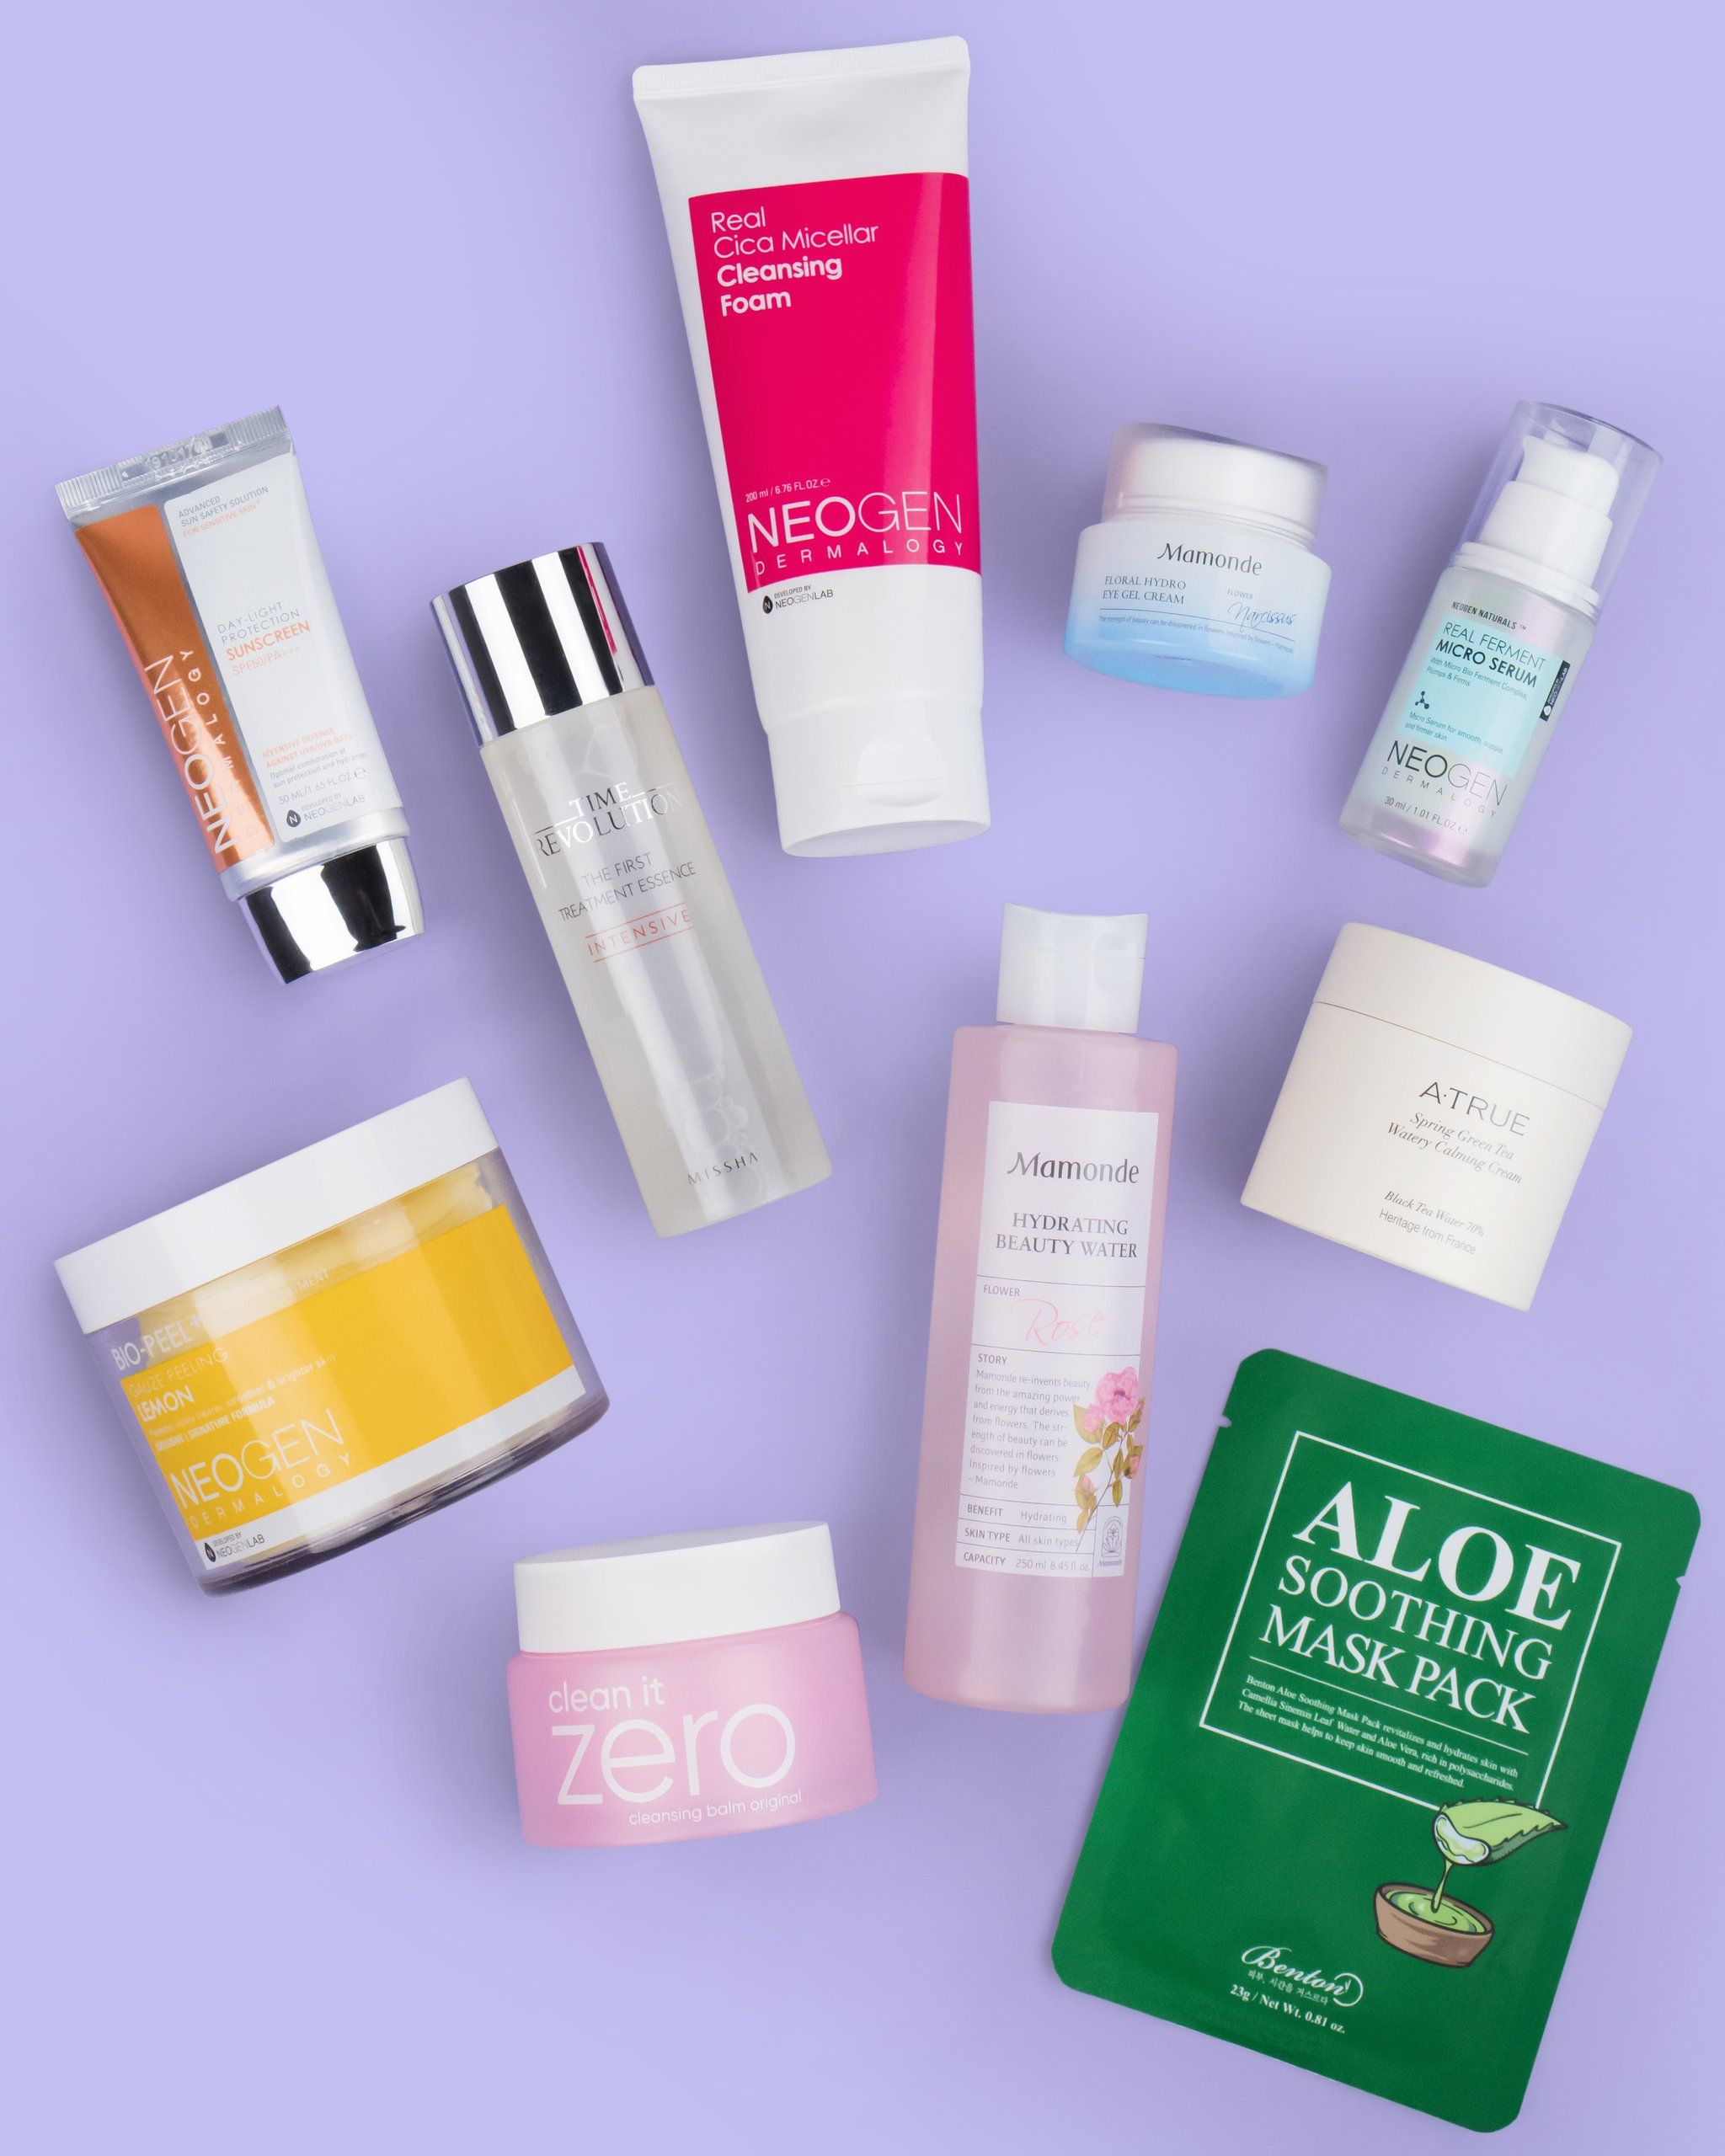 10 Step Korean Skincare Routine Set For Normal Skin Korean Skincare Routine Korean 10 Step Skin Care Korean Skincare